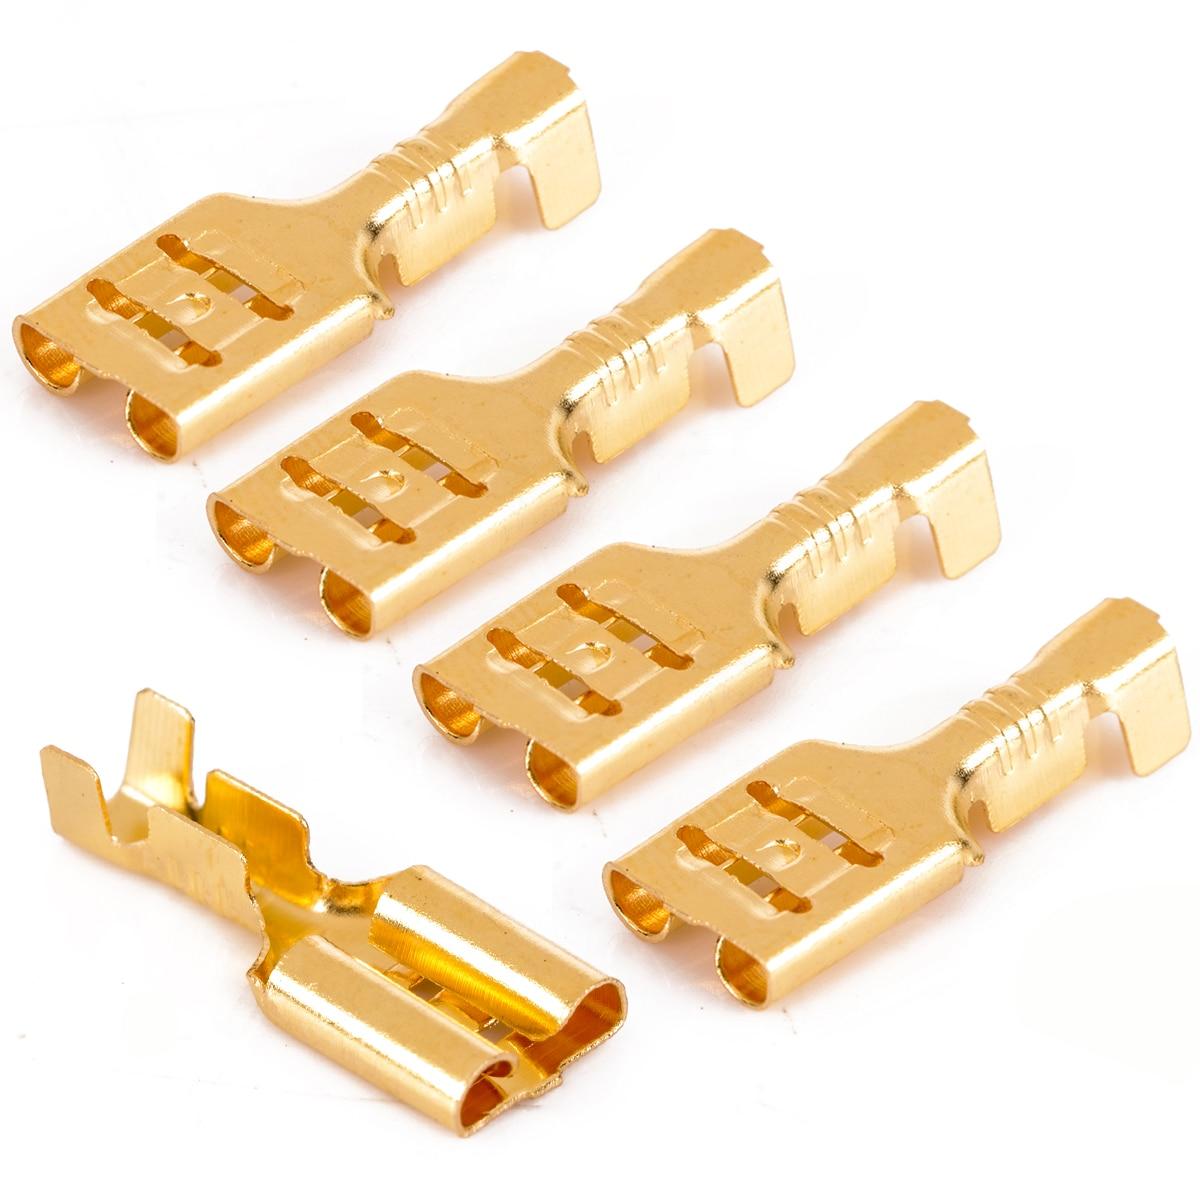 Quick Disconnect 6.3mm Brass Crimp Terminal Cable Female Spade Connector 50PCS